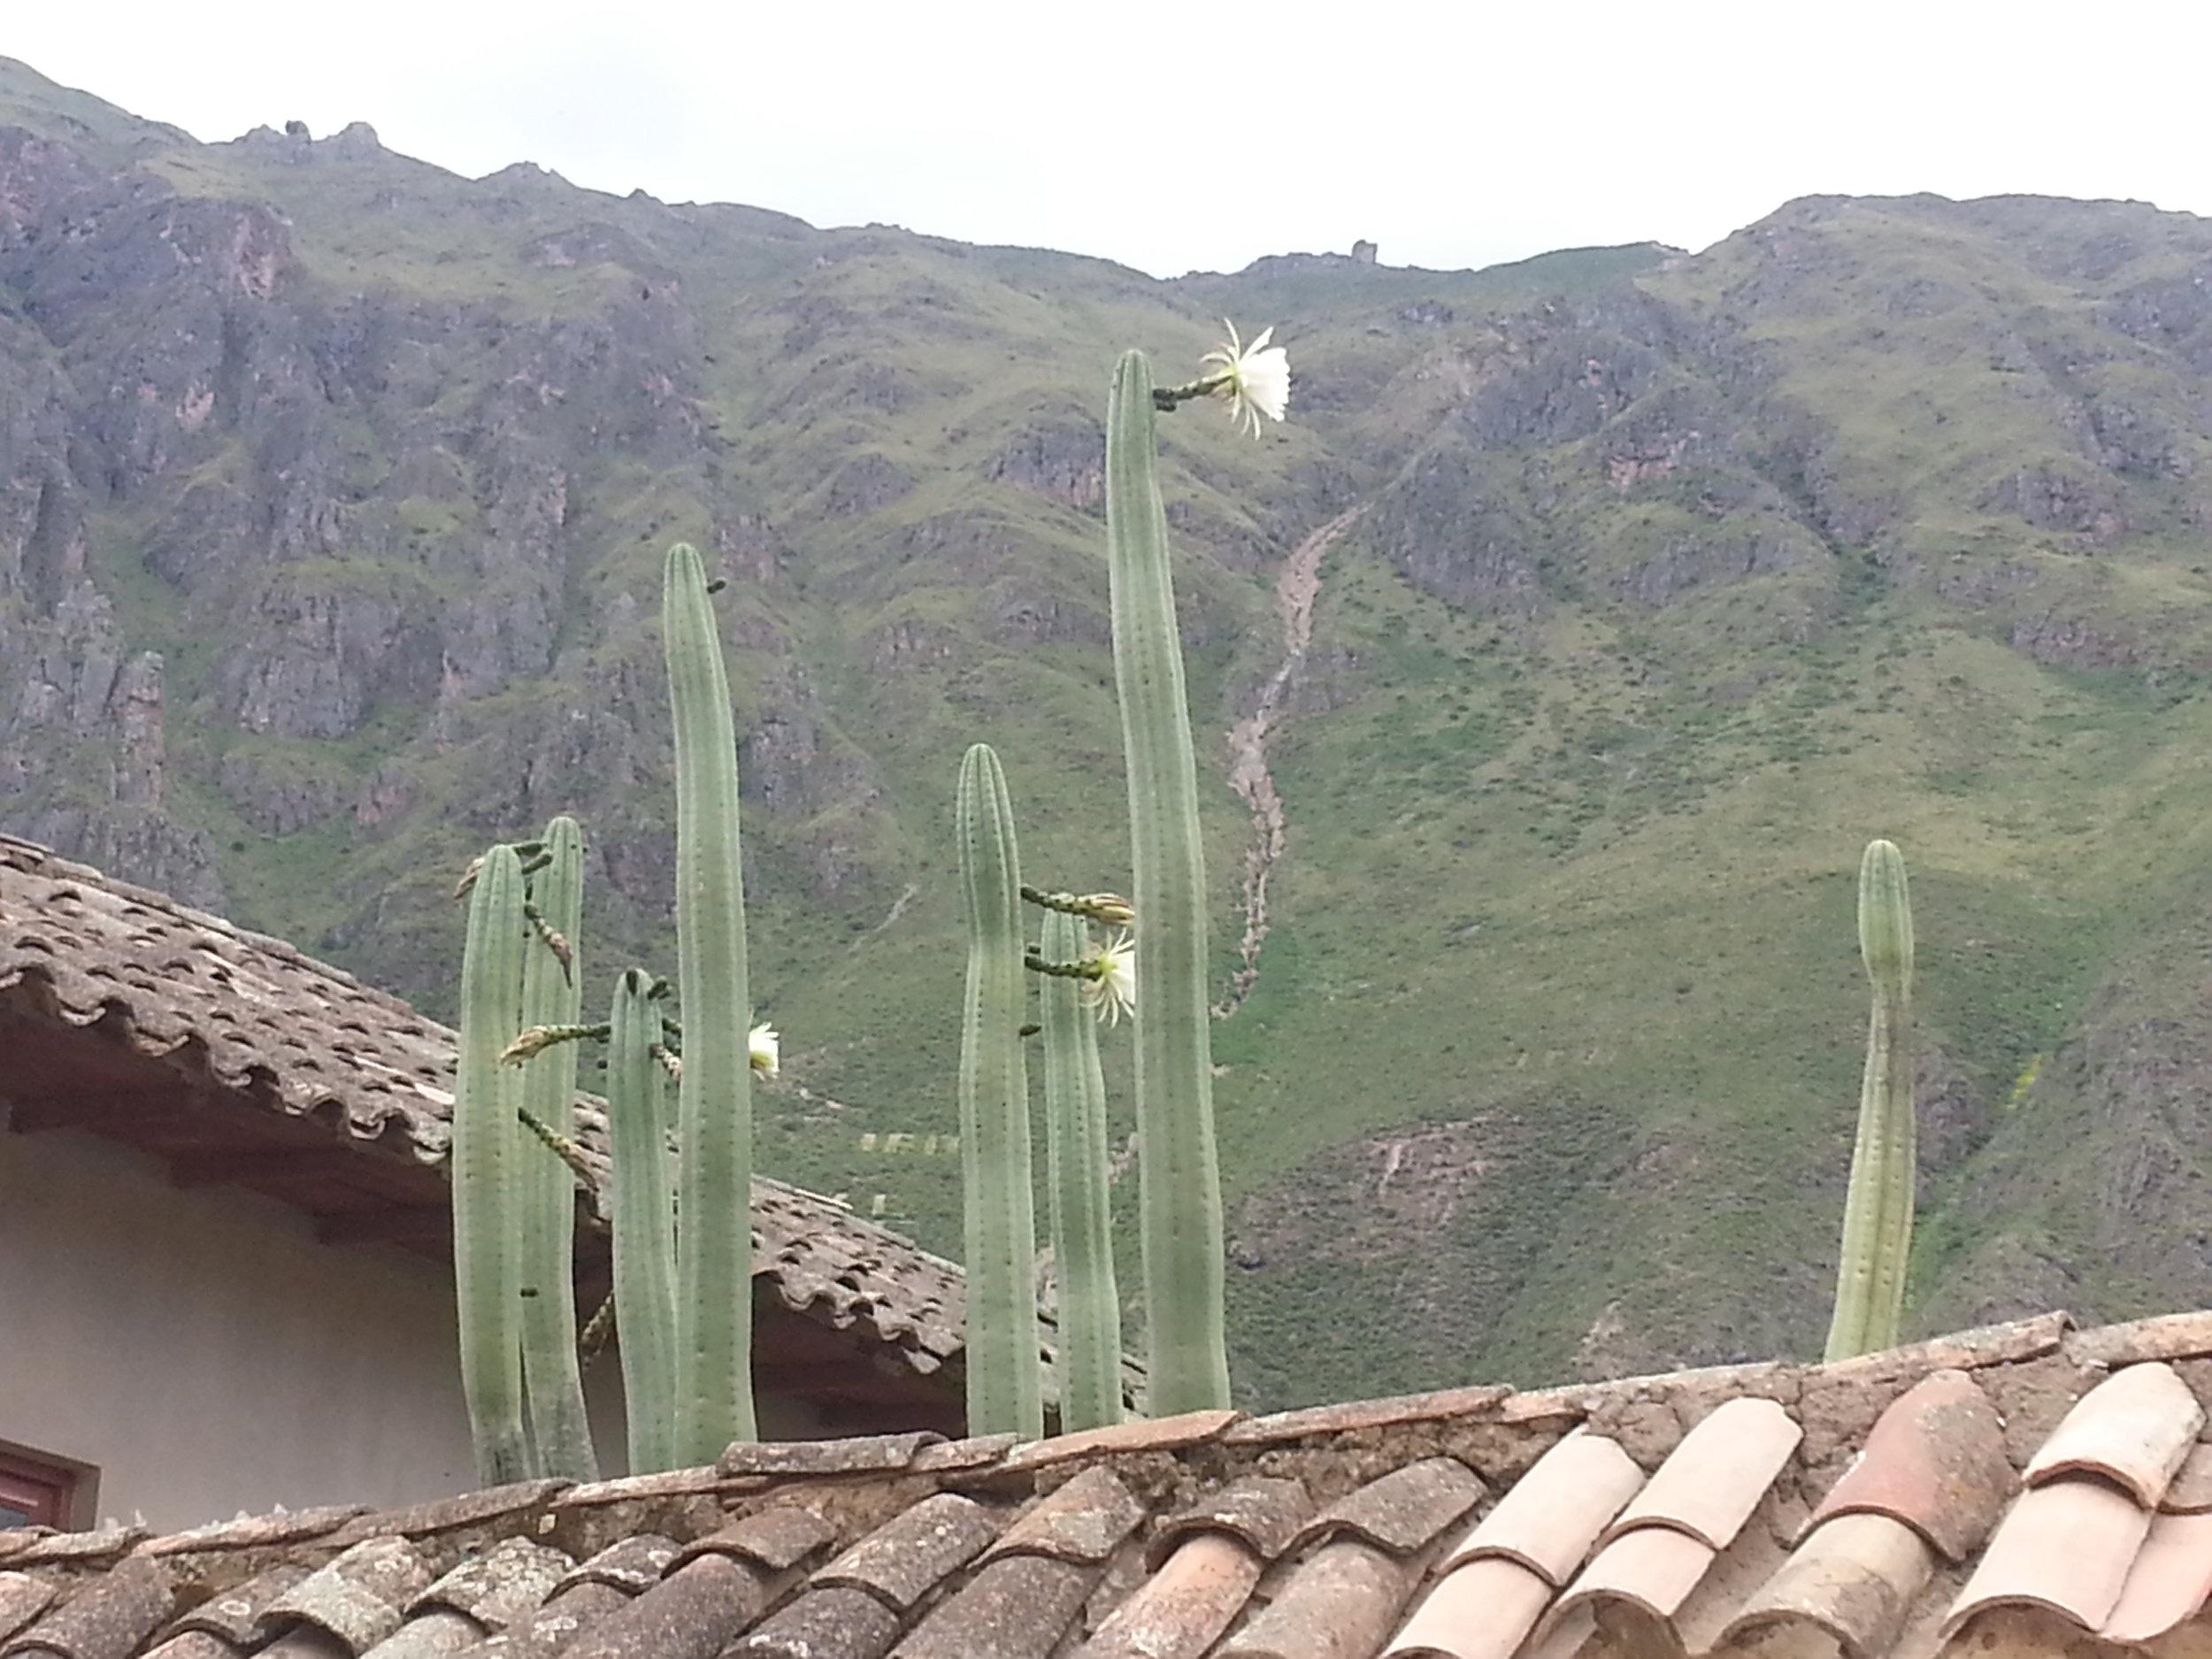 Huachuma in bloom, Ollantaytambo, Peru.